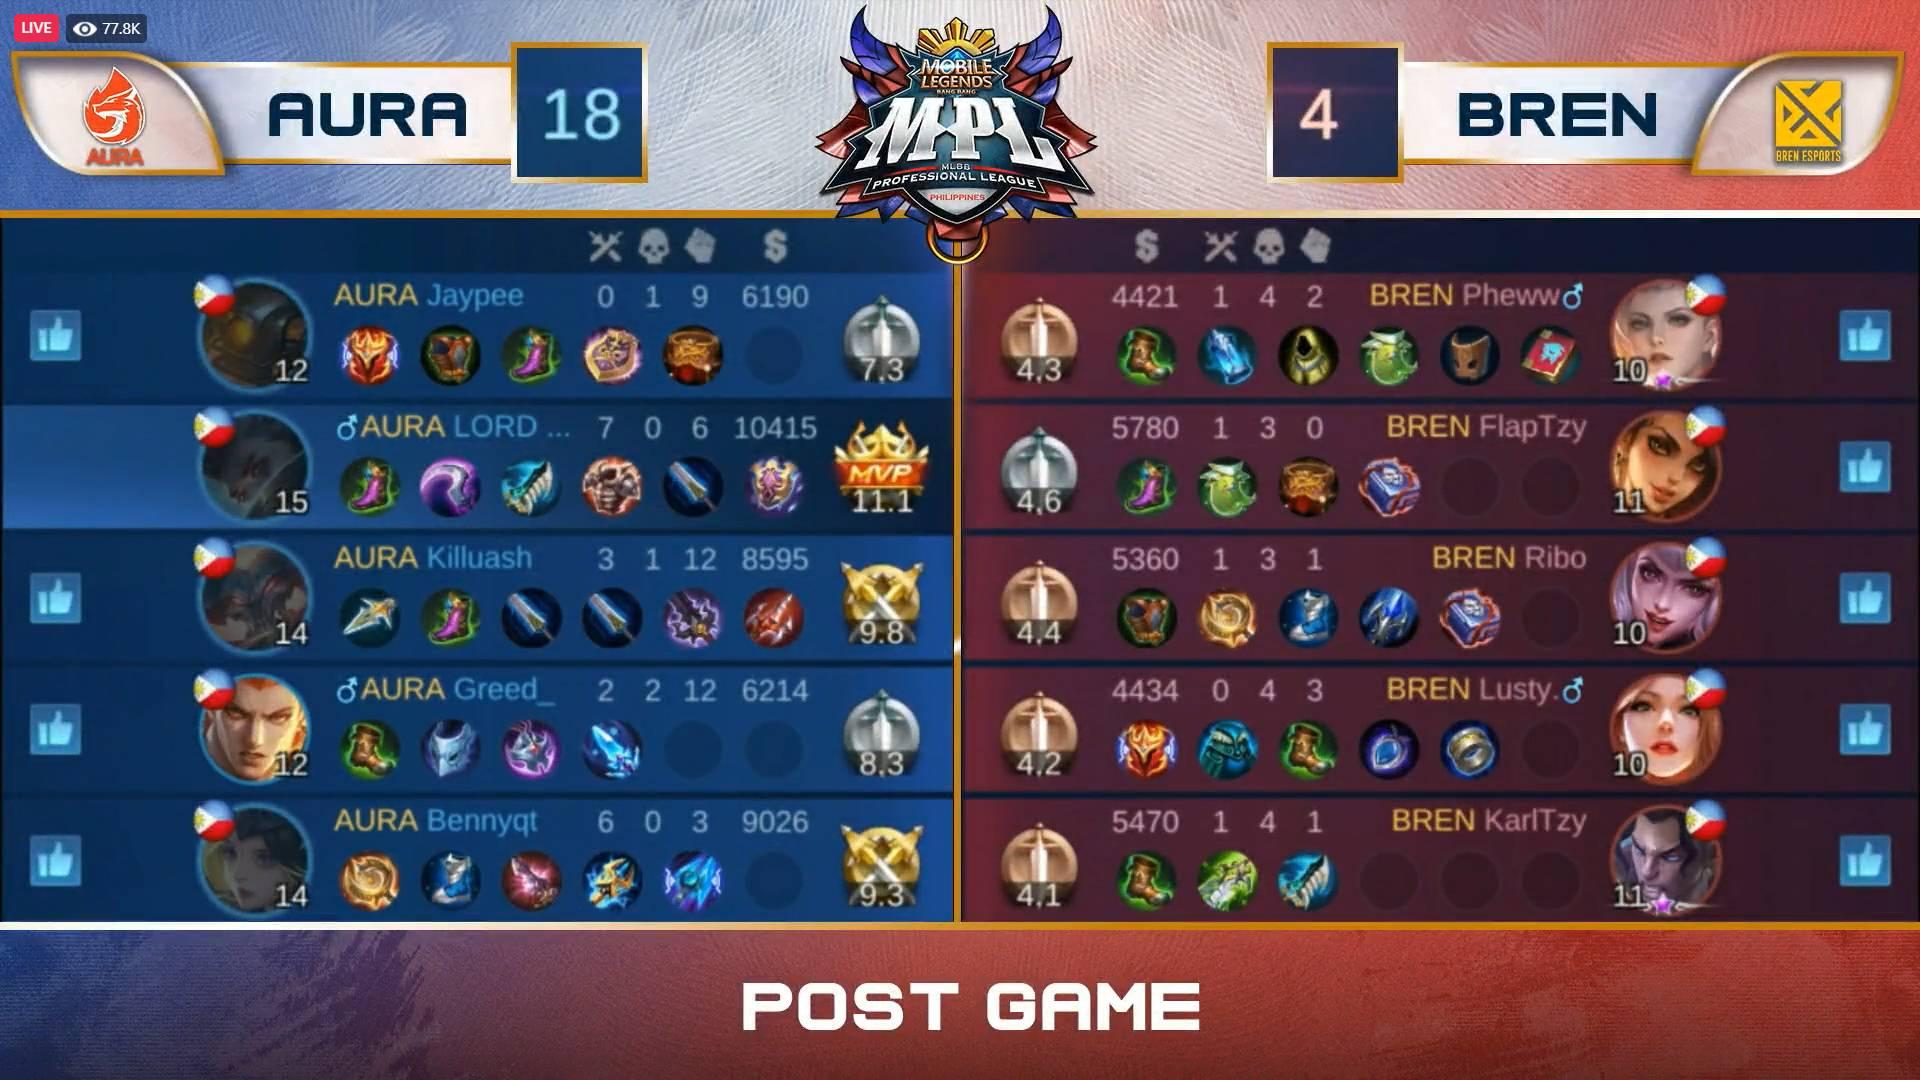 MPL-PH-7-AURA-def-BREN-Game-2 Aura PH continues BREN's woes in MPL-PH 7 ESports Mobile Legends MPL-PH News  - philippine sports news